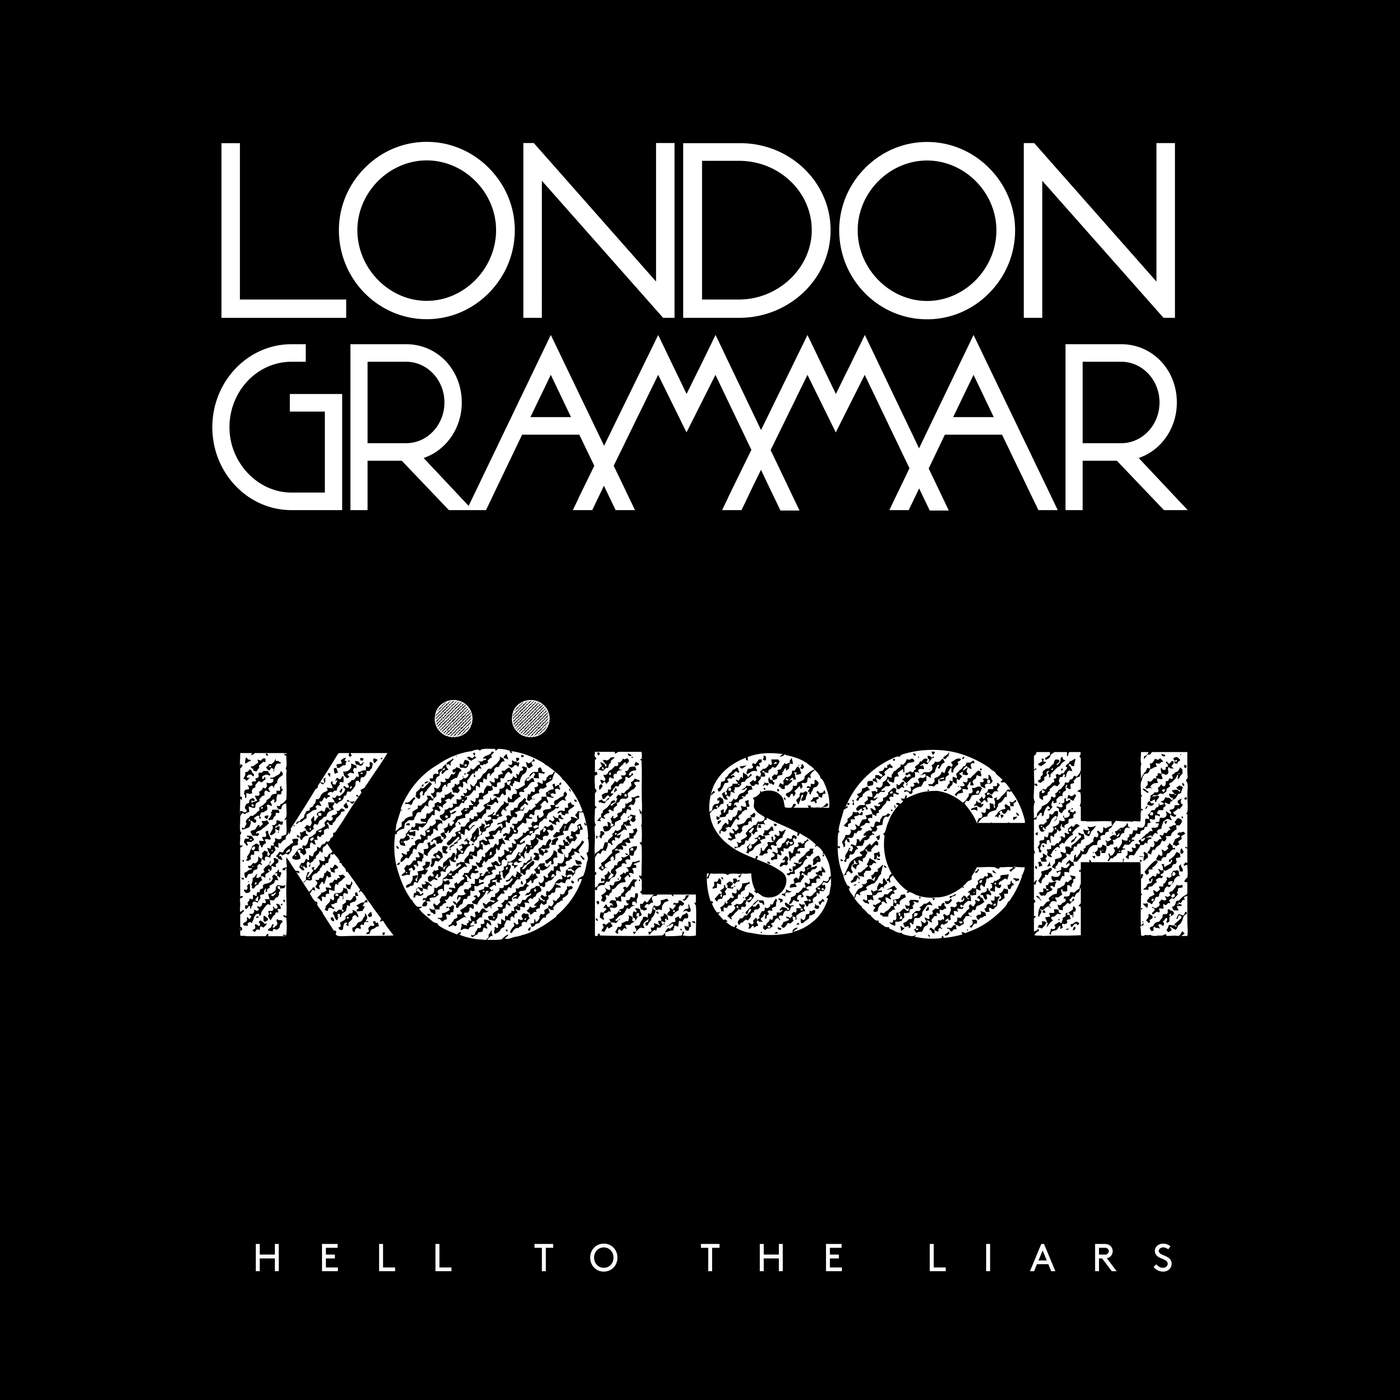 London Grammar - Hell To the Liars (Kölsch Remix) - EP